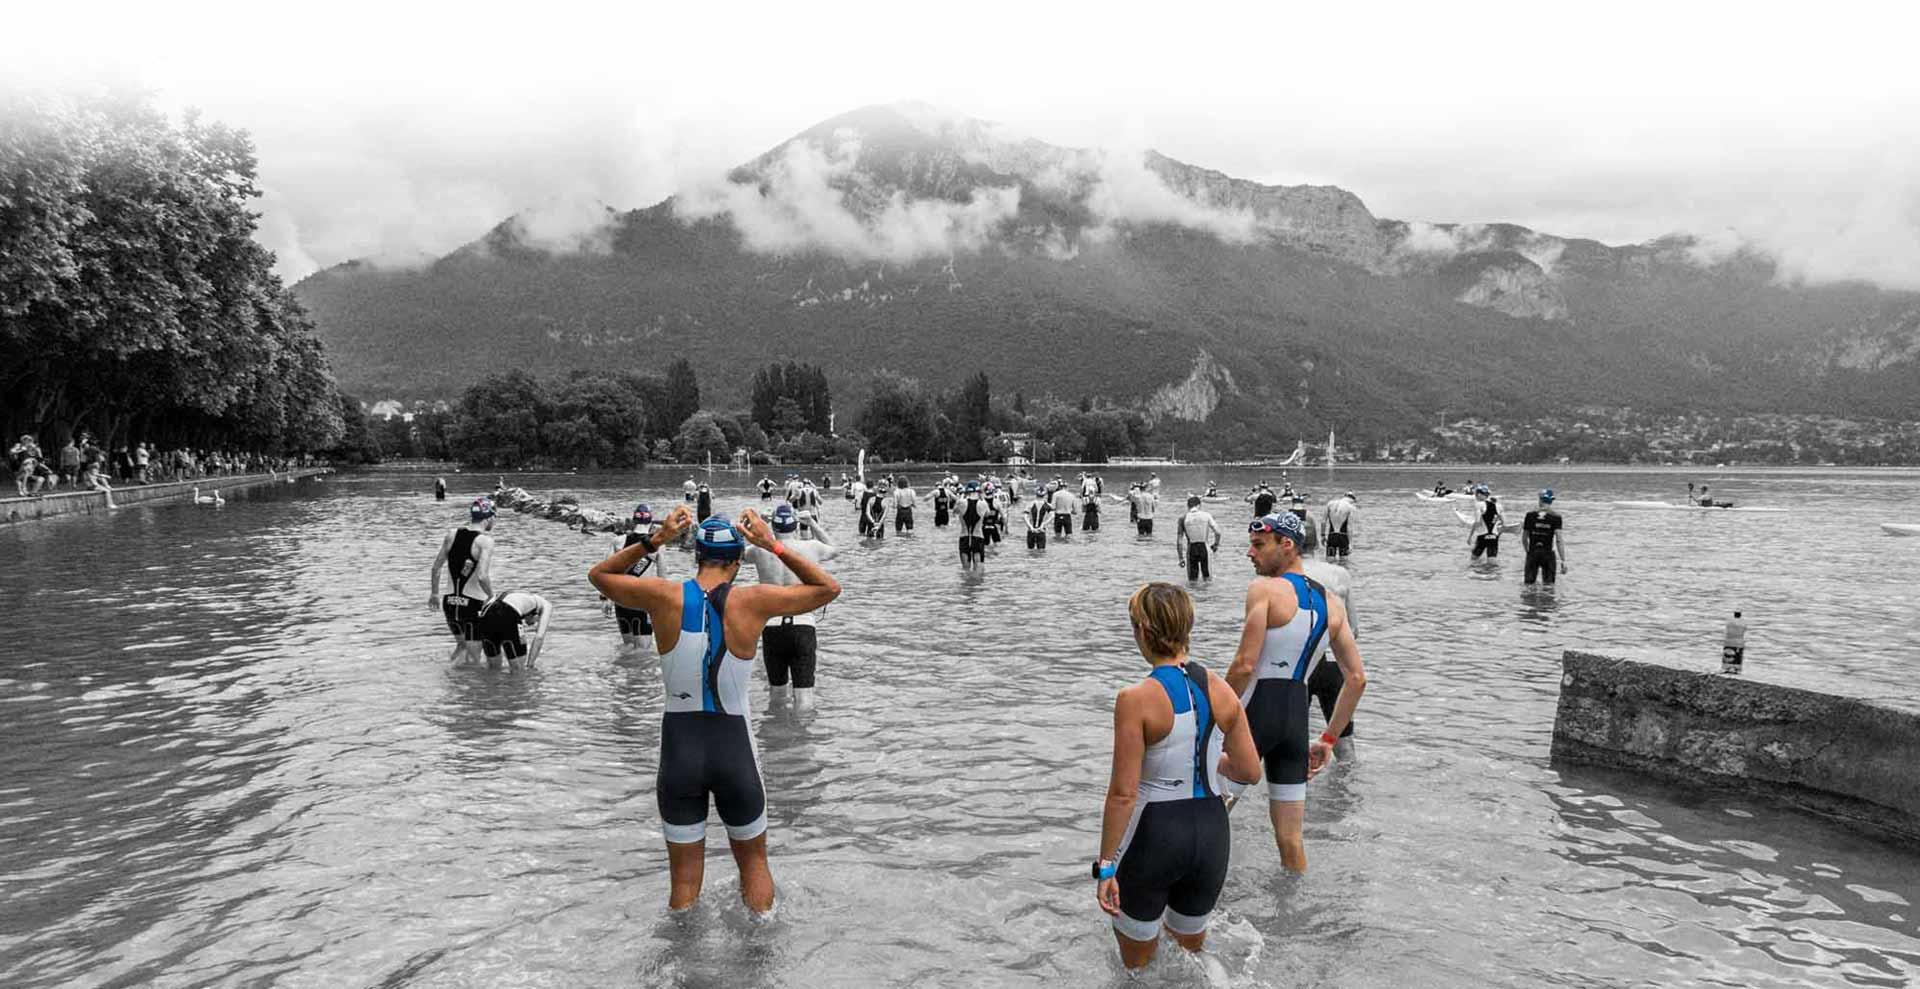 nageurs-triathlon